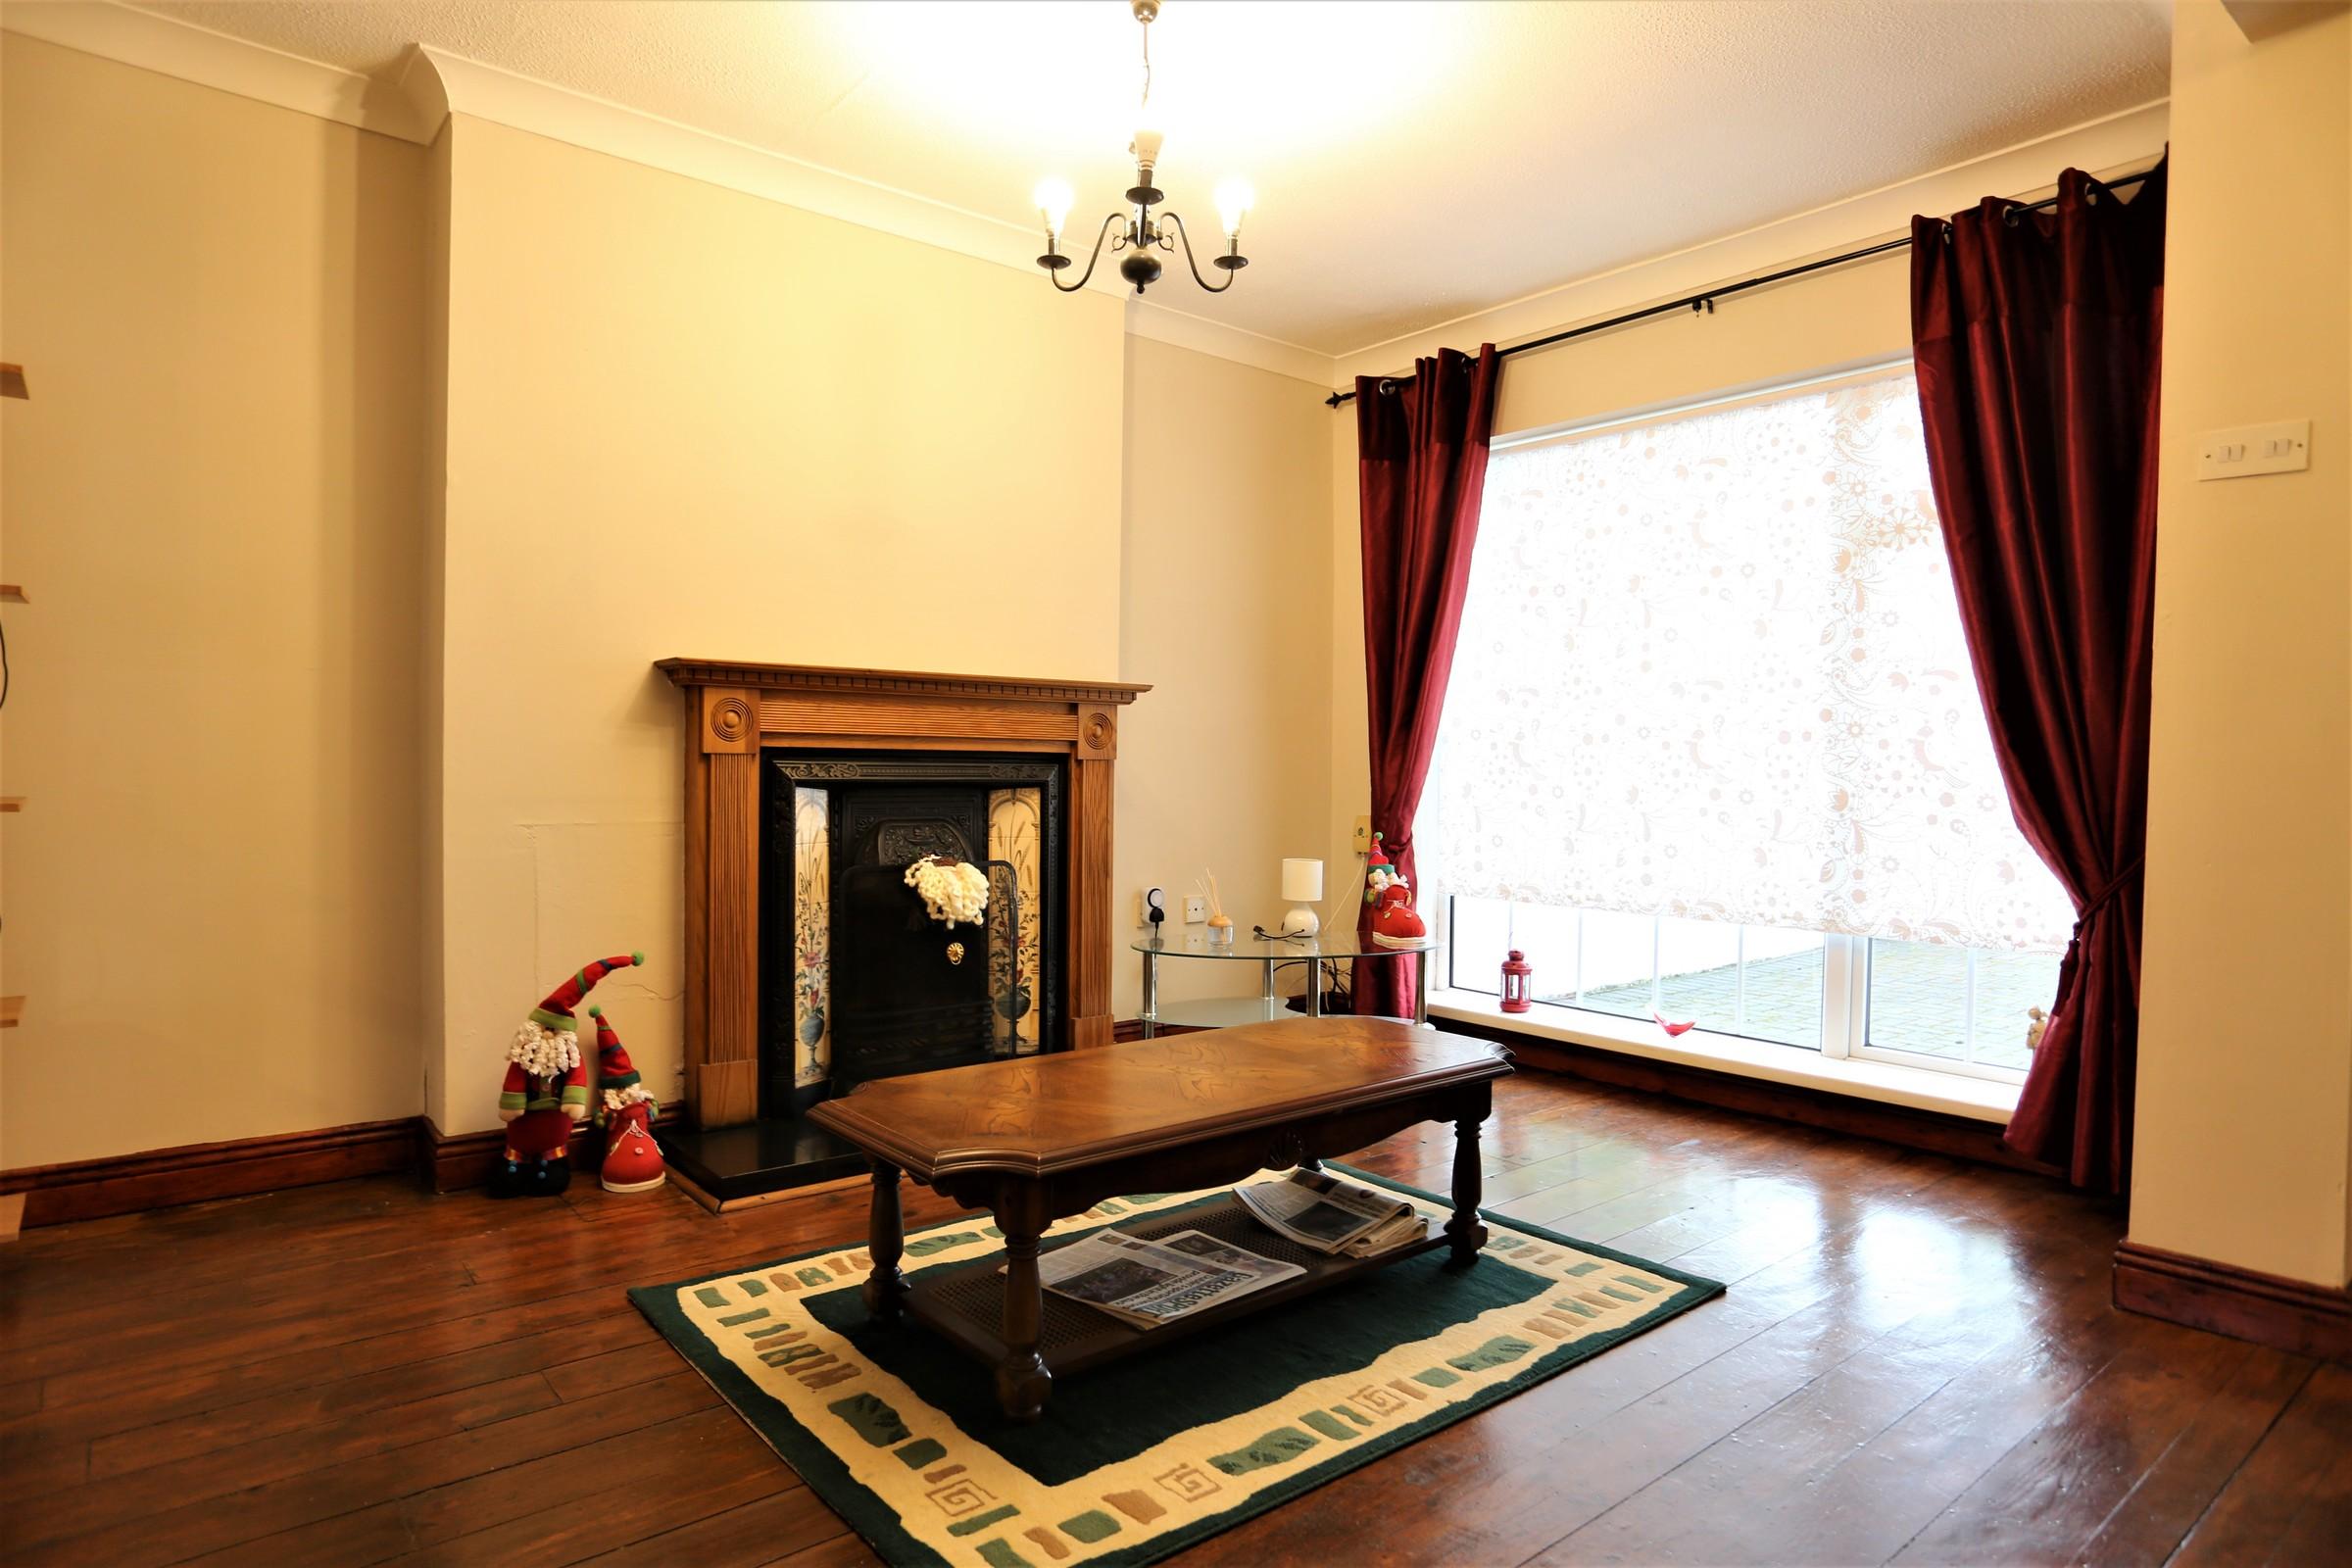 27 Cherrywood Villas, Clondalkin, Dublin 22